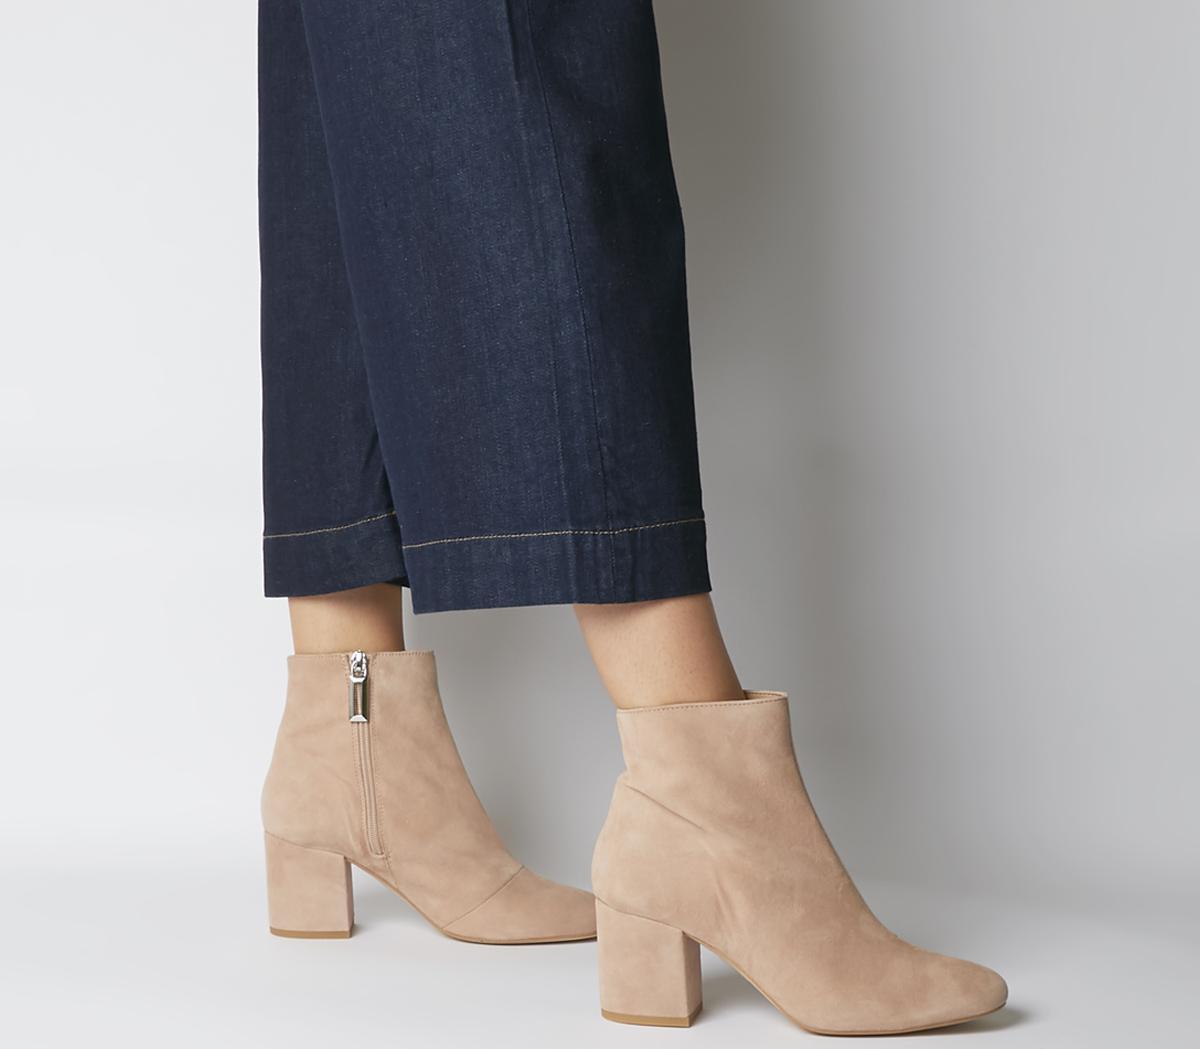 Amoretti Black Heel Boots